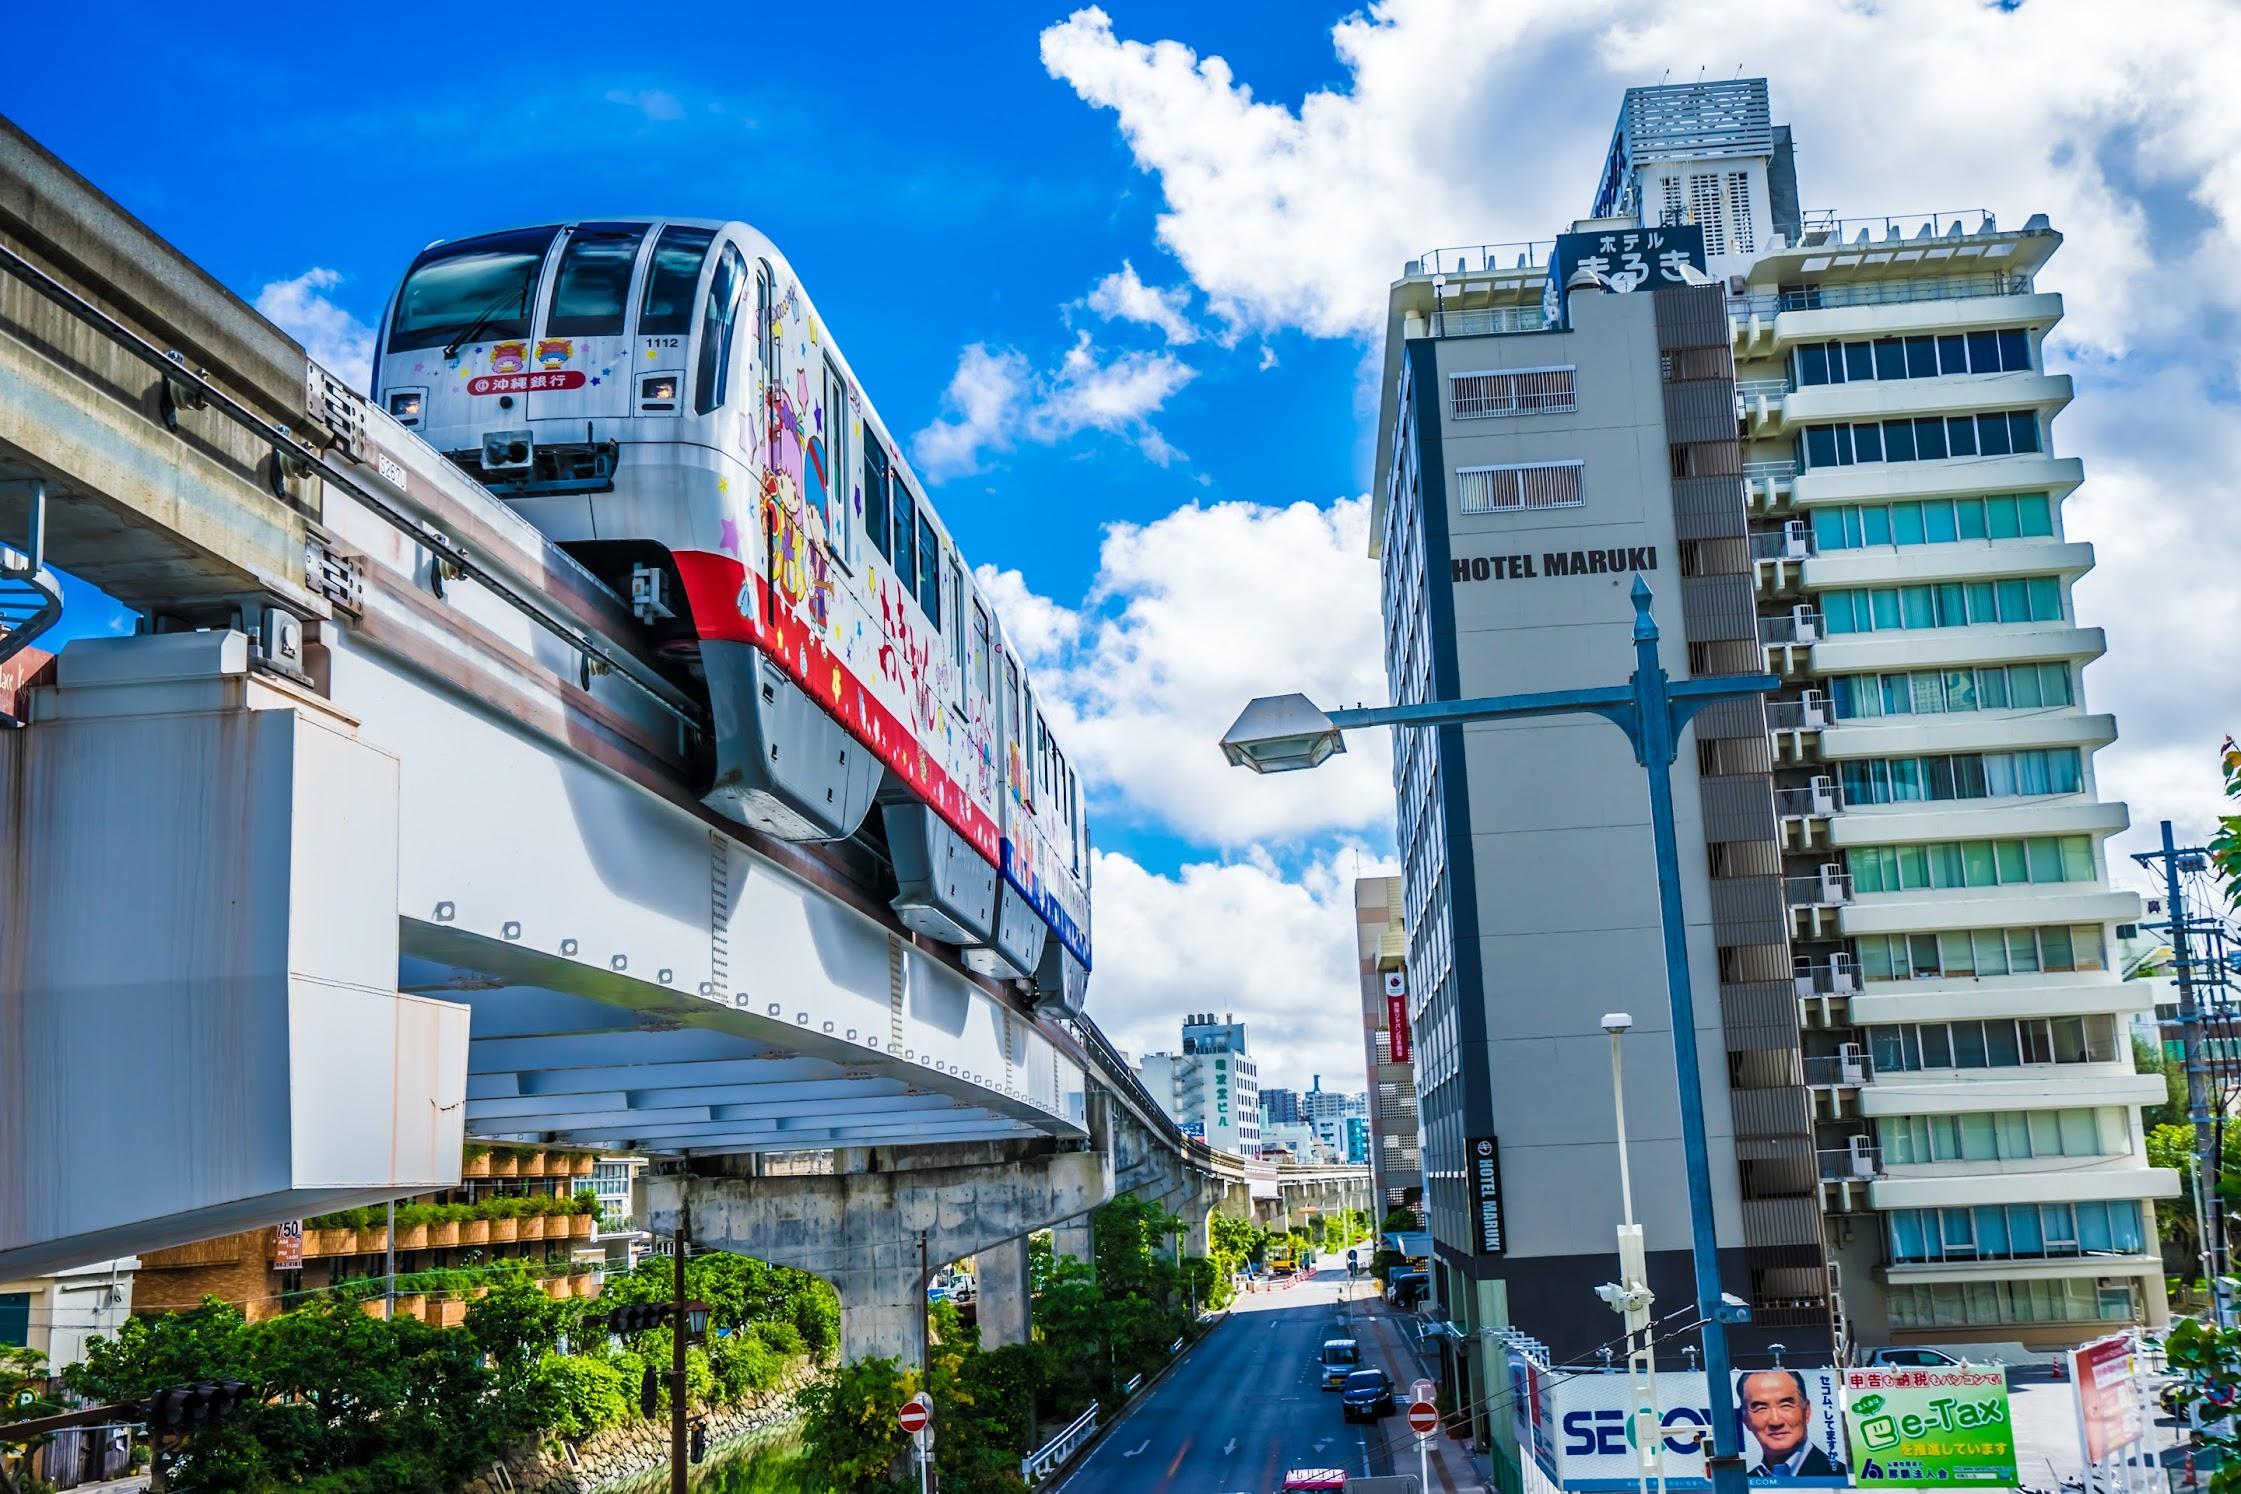 Naha monorail2